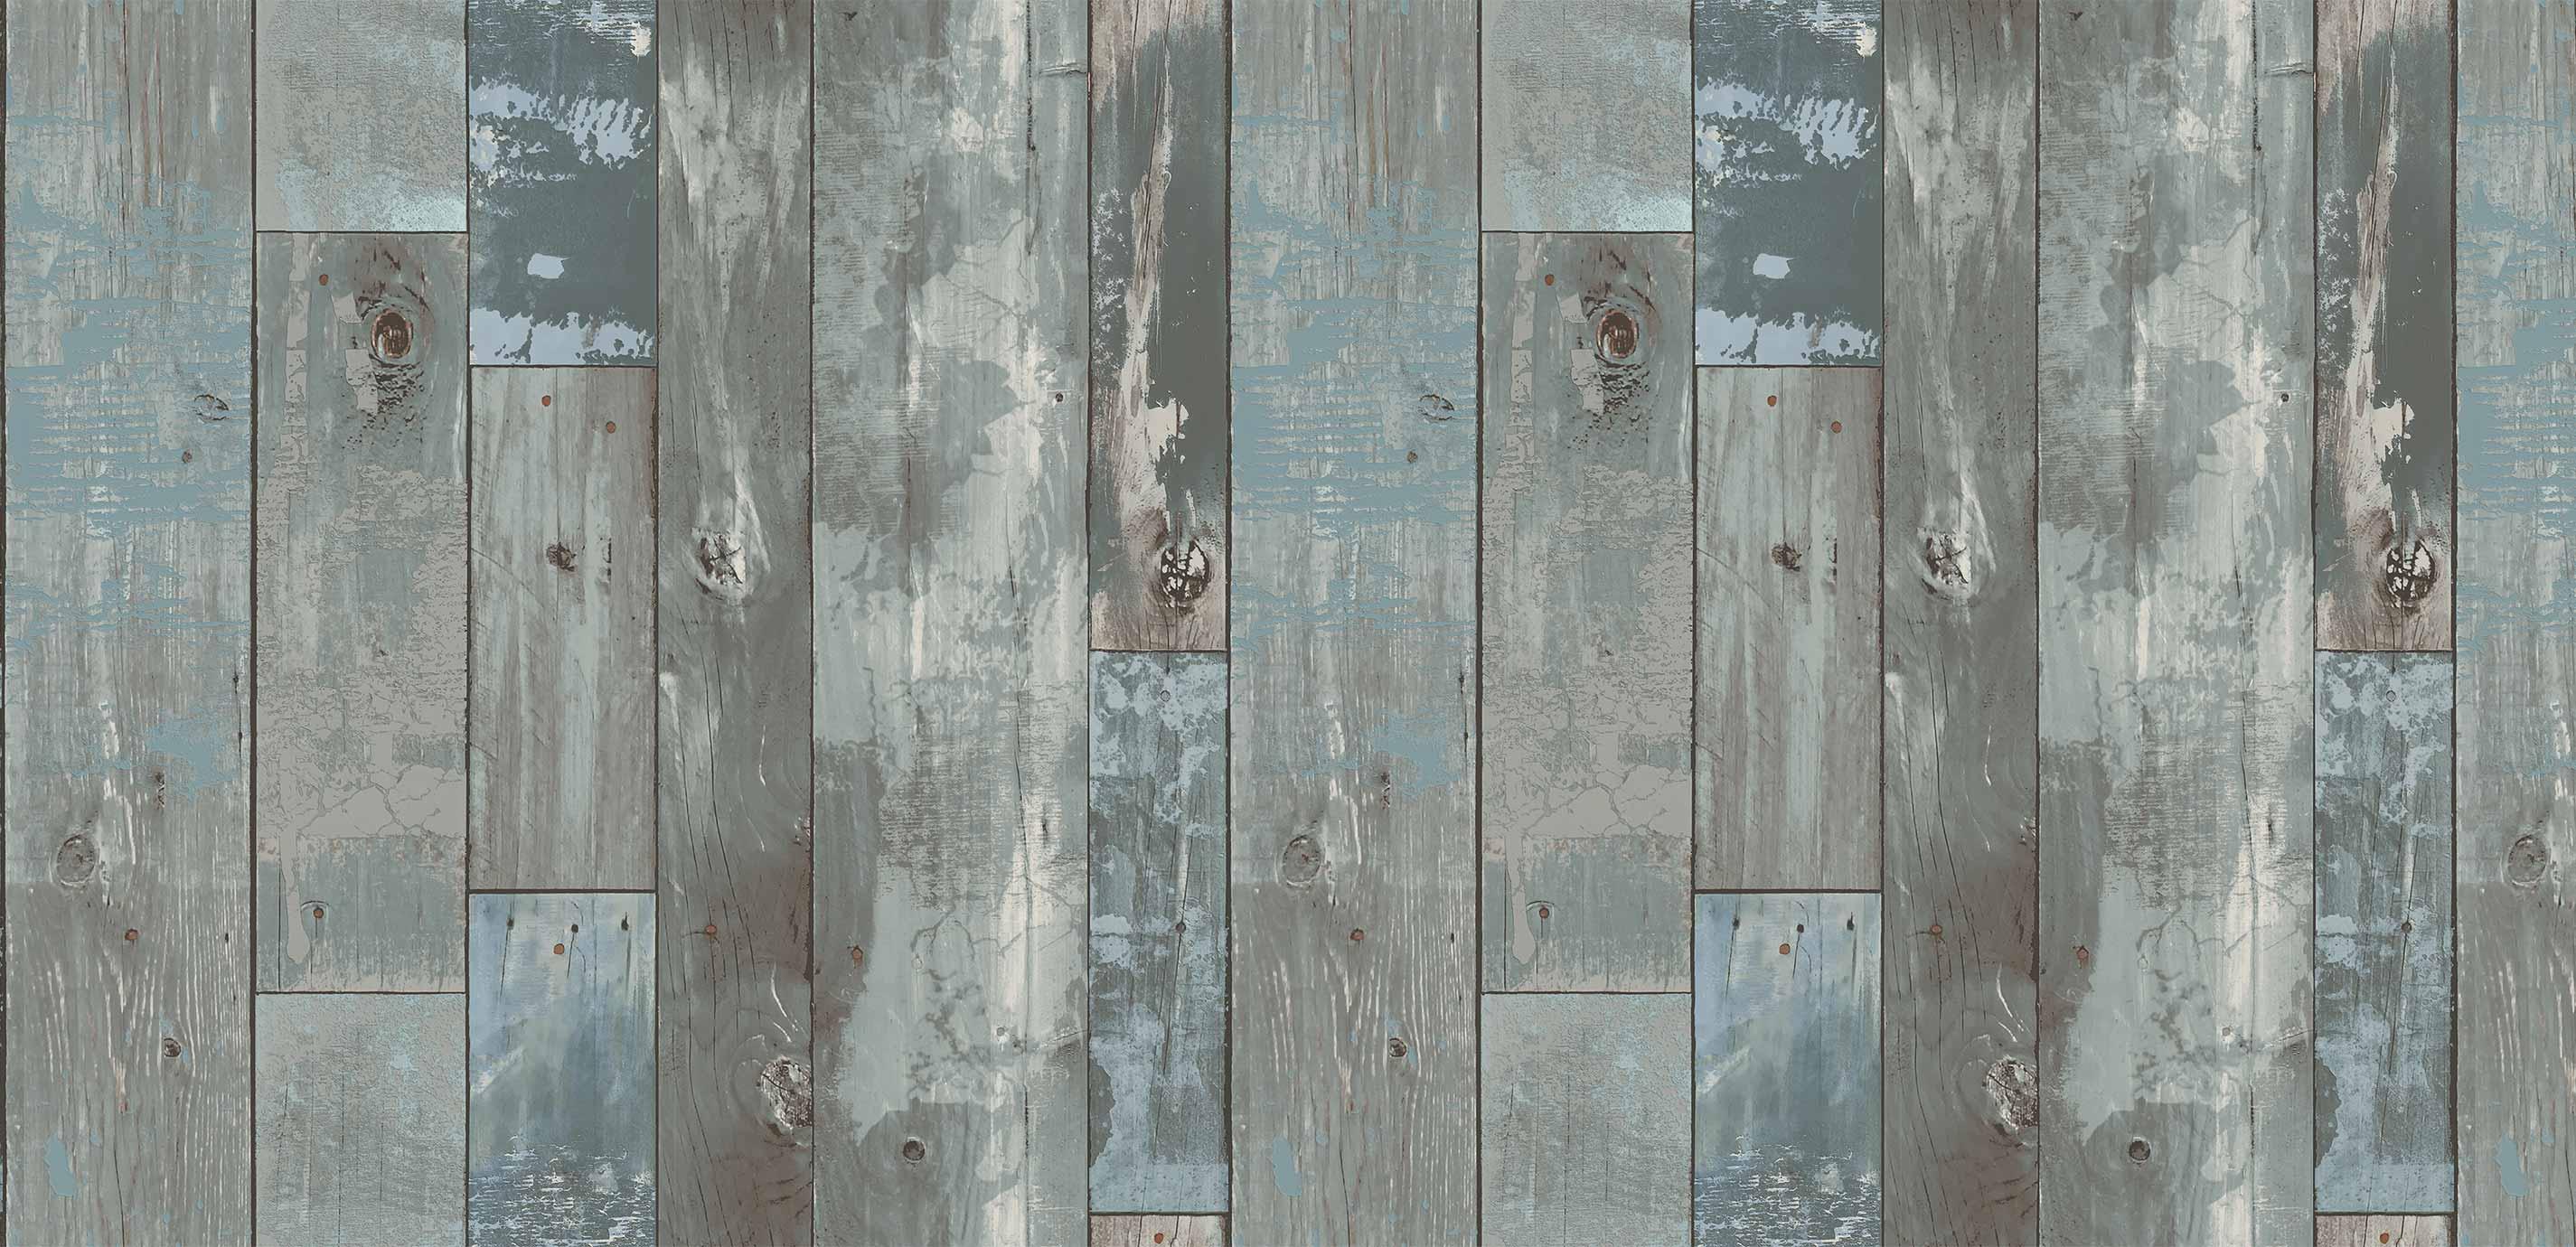 Deena Distressed Rustic Wood Plank